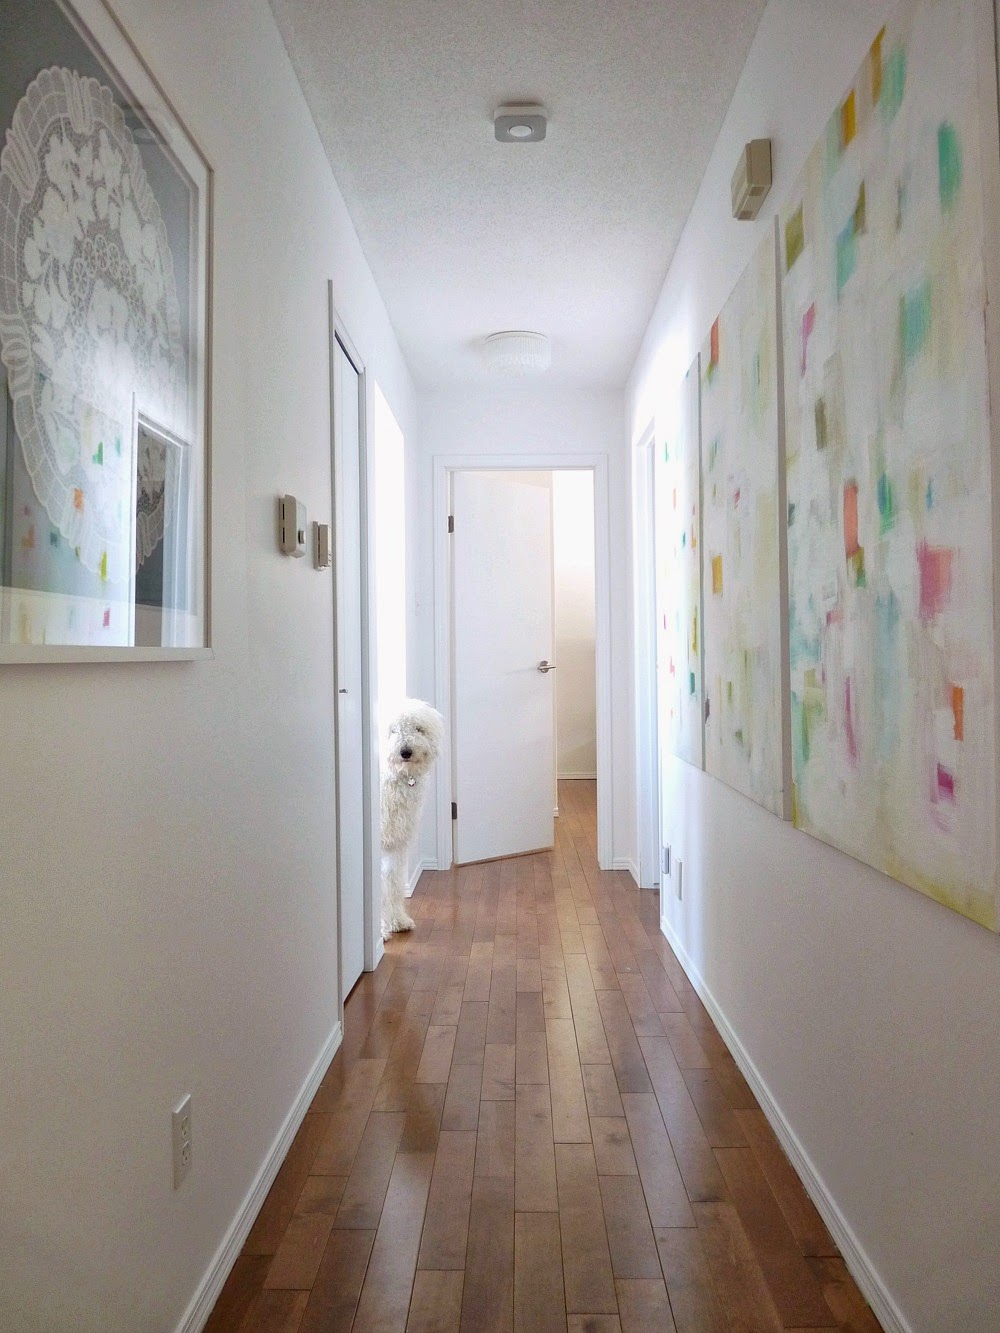 Mid-Century Modern Inspired Interior Door Levers & Mid-Century Modern Inspired Interior Door Levers | Dans le Lakehouse